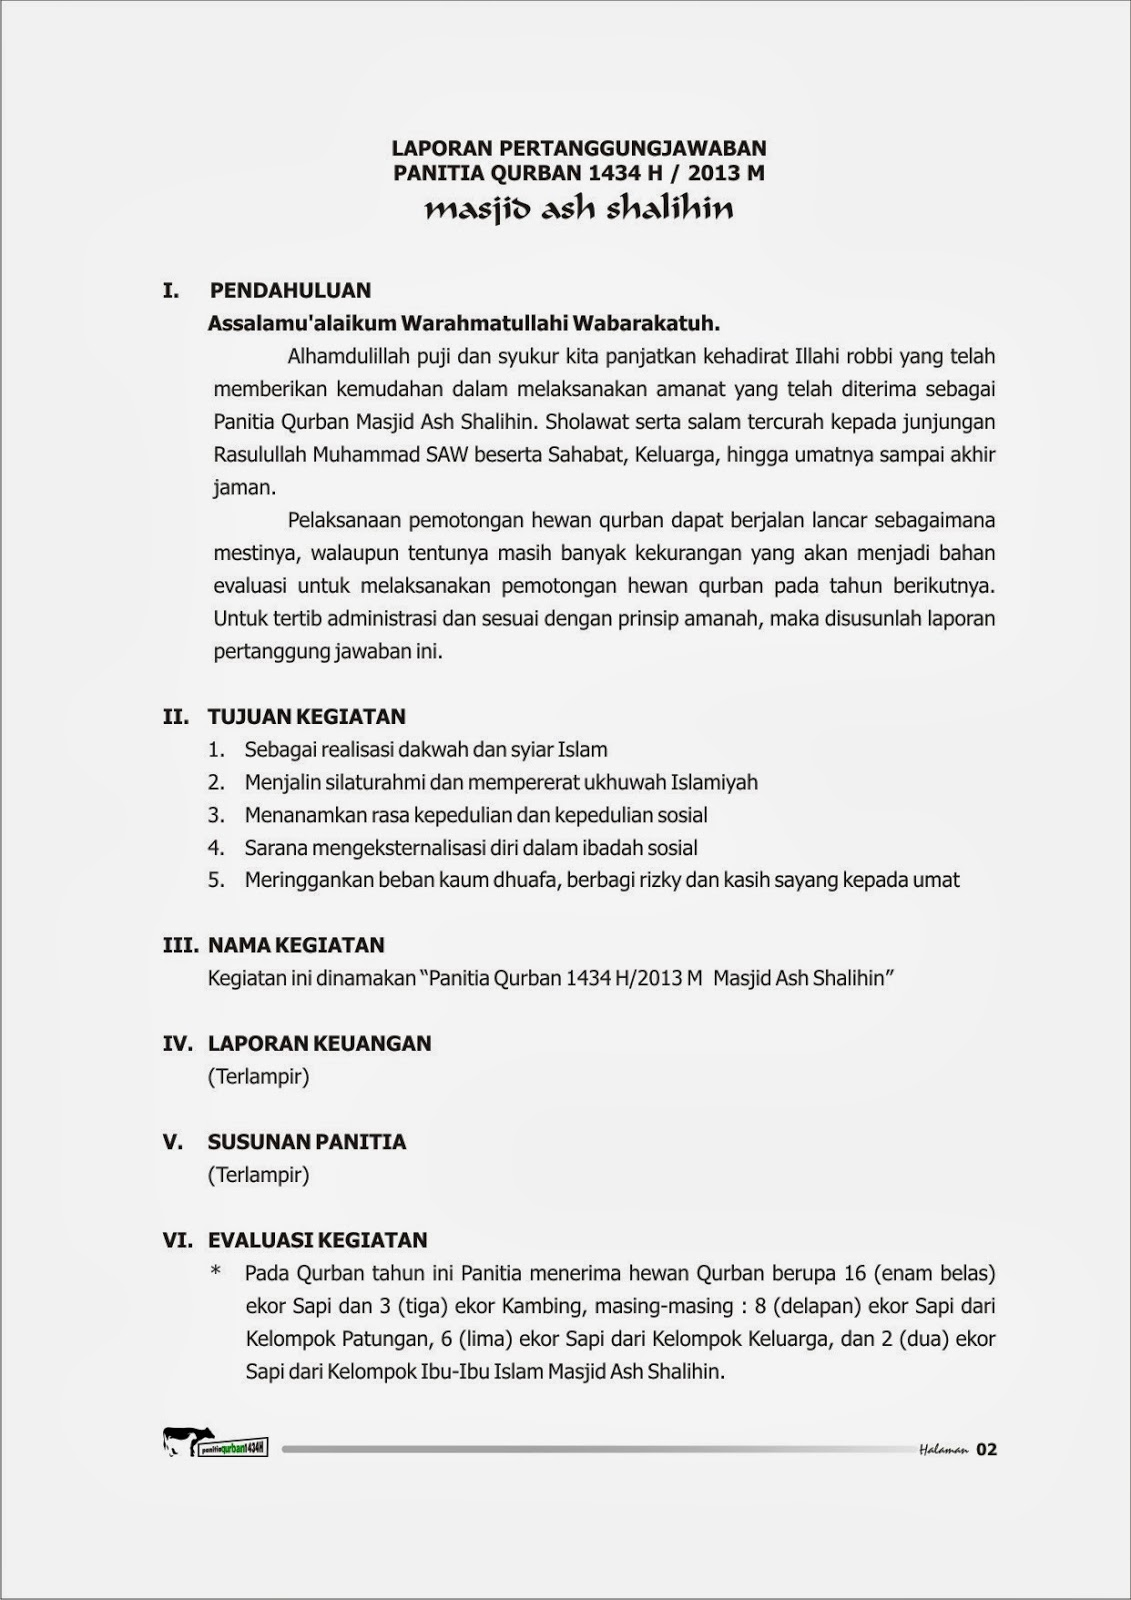 Surat Undangan Panitia Qurban